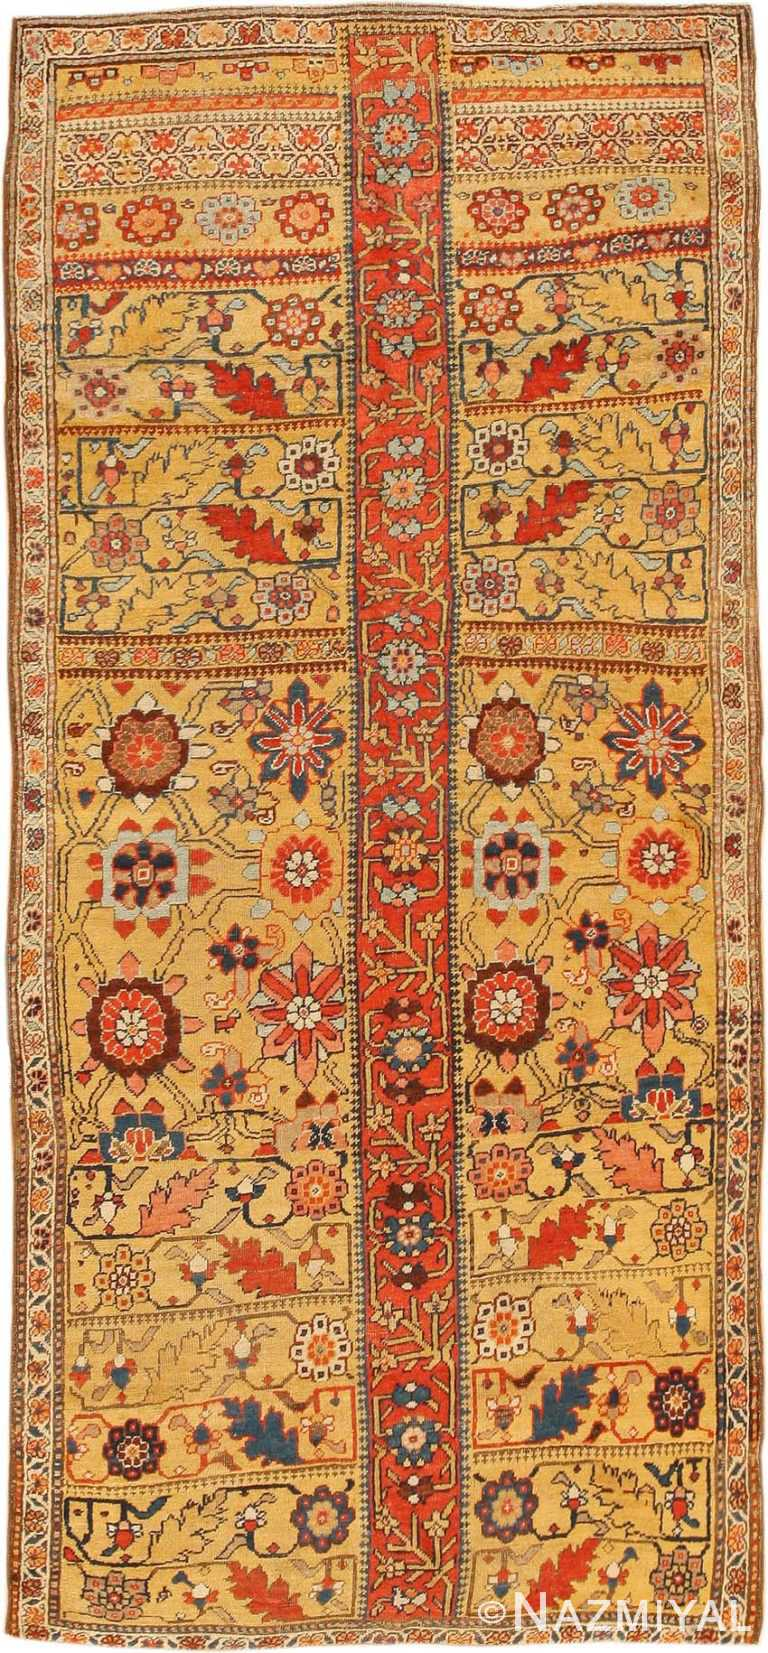 Antique Kurdish Bidjar Persian Sampler Rug 40485 Nazmiyal